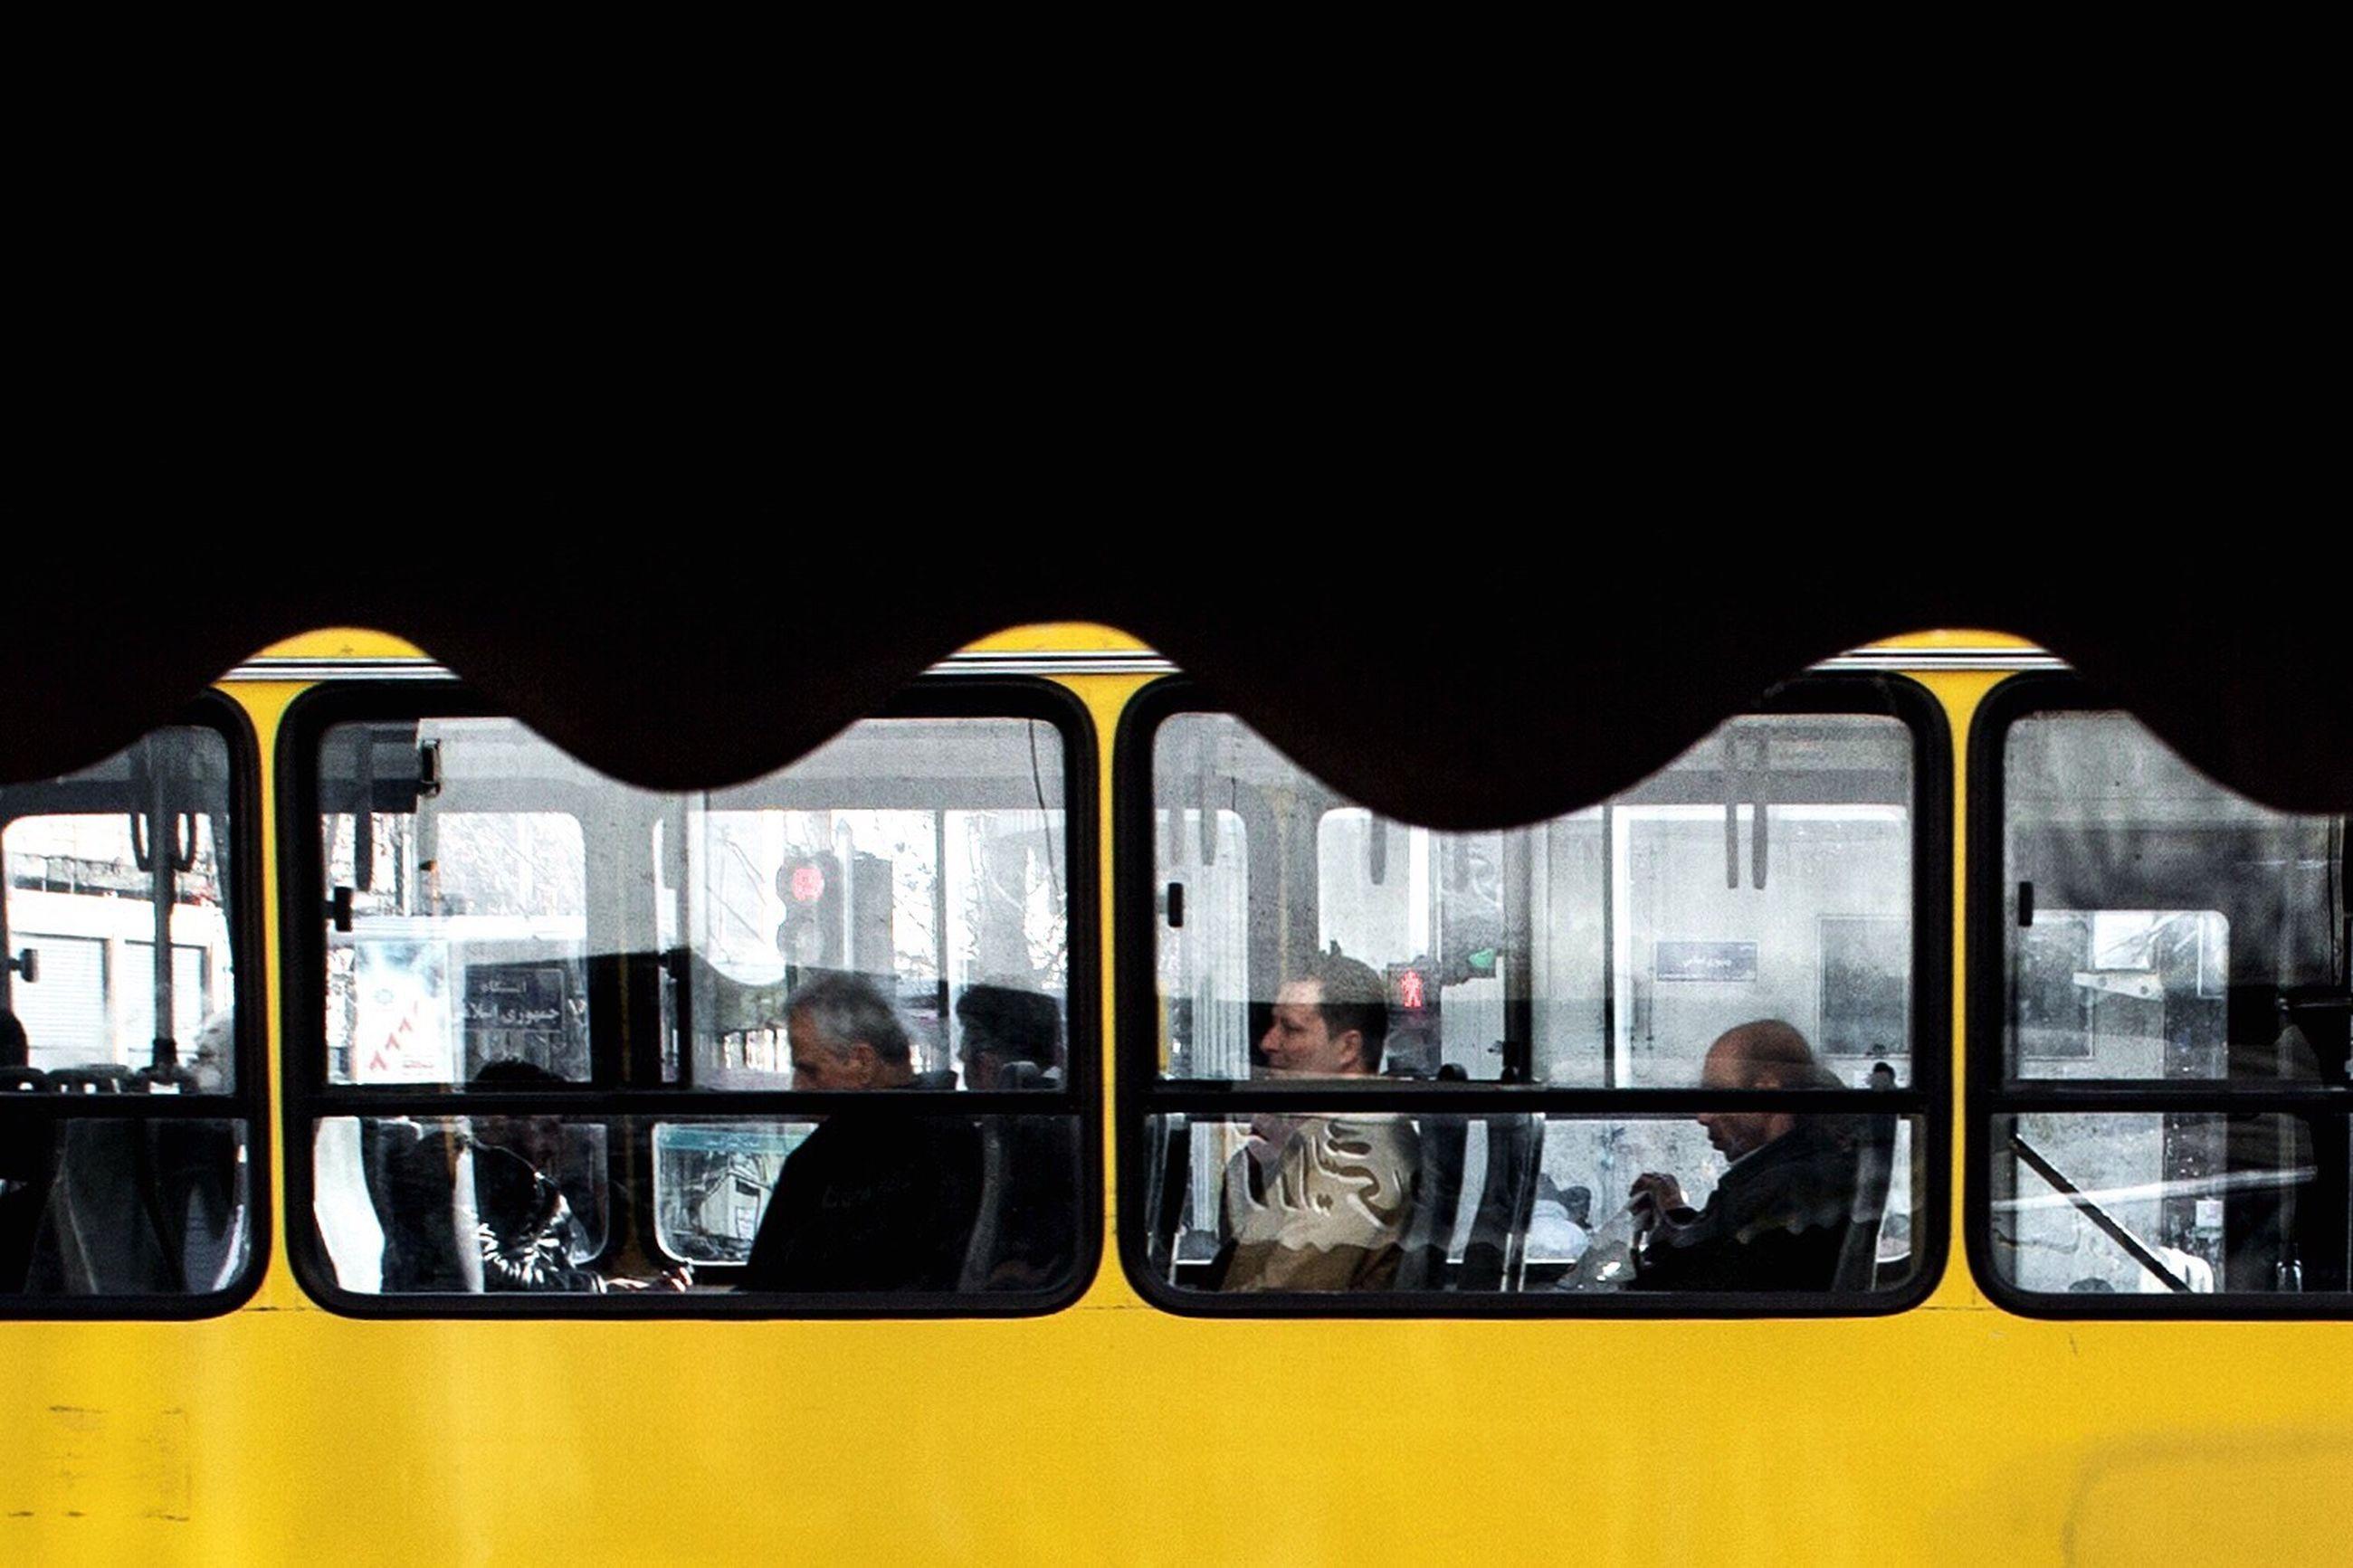 transportation, mode of transport, public transportation, window, train - vehicle, yellow, land vehicle, real people, day, men, subway train, outdoors, adult, people